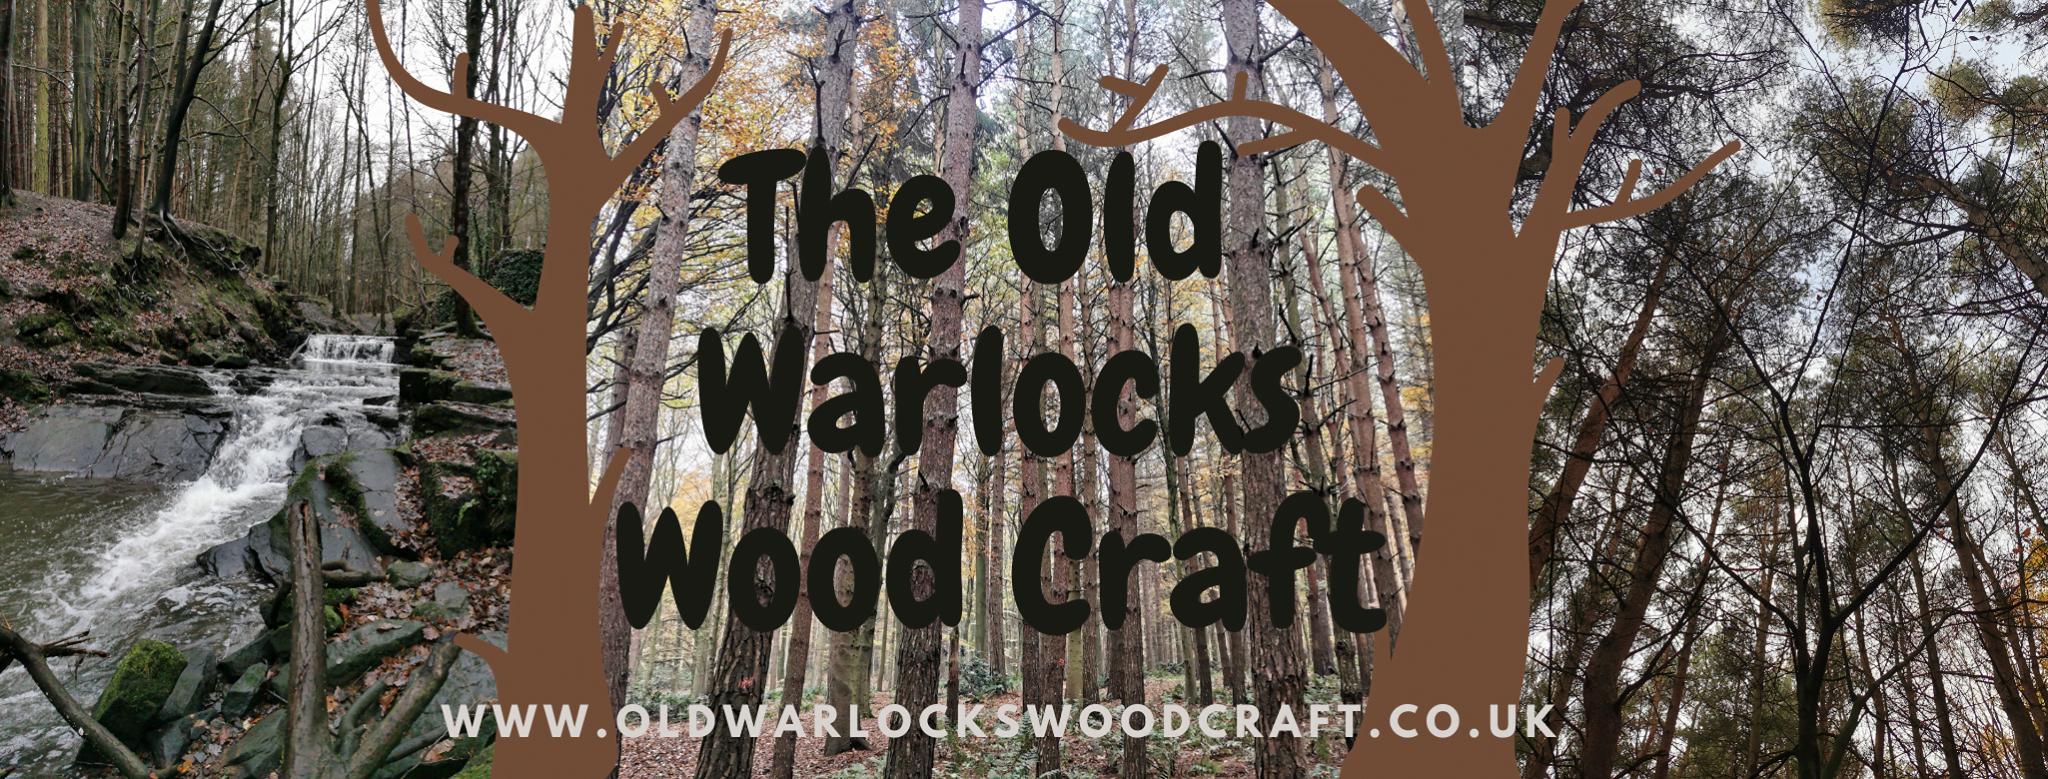 Oldwarlockswoodcraft